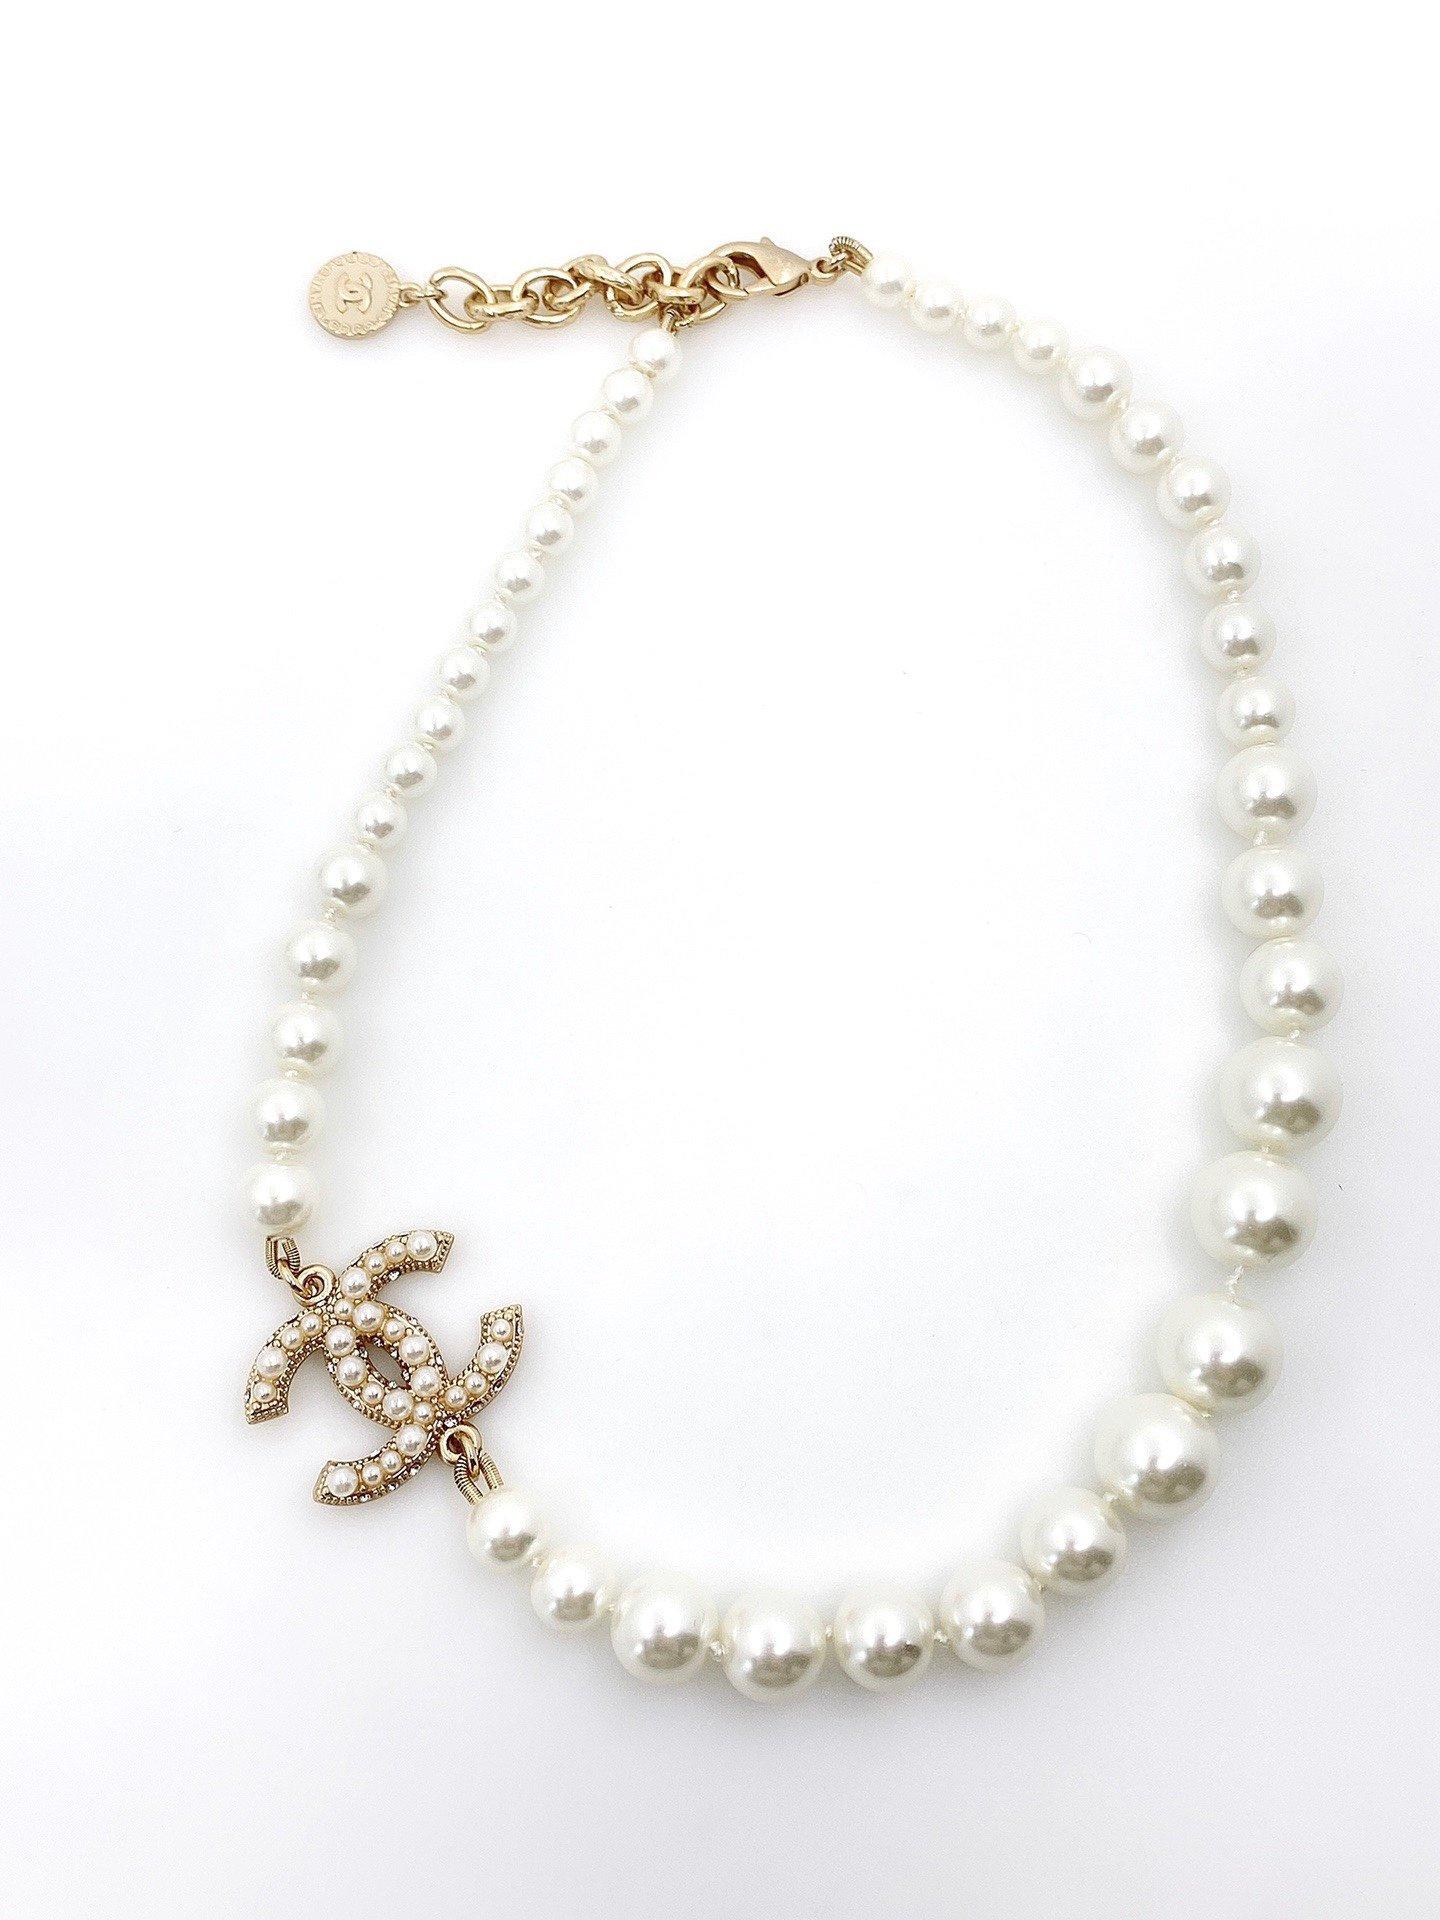 CHANEL小香大小珍珠双c项链高端